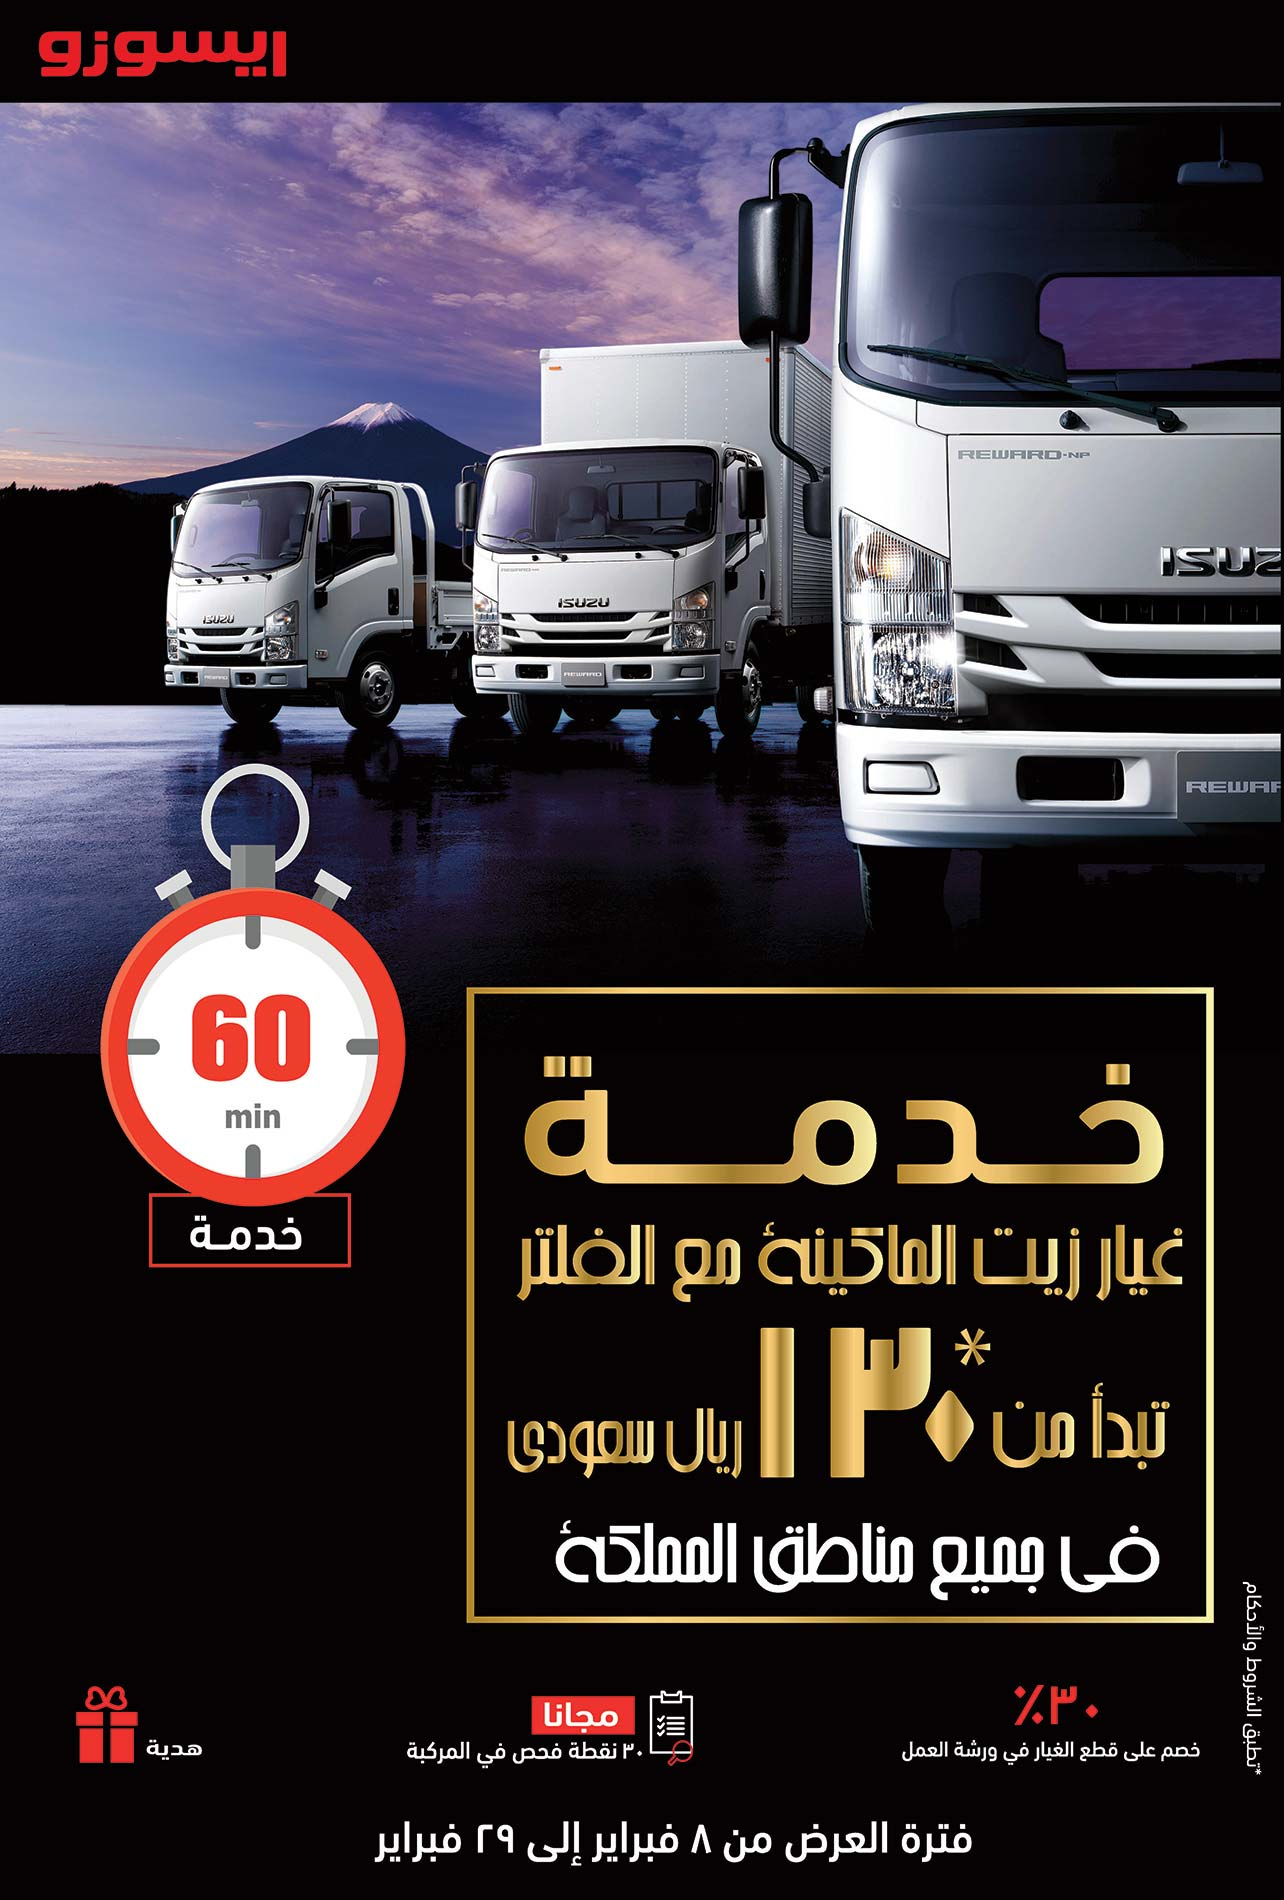 Isuzu 60 min Service with Competitive Price in KSA - Arabic Banner